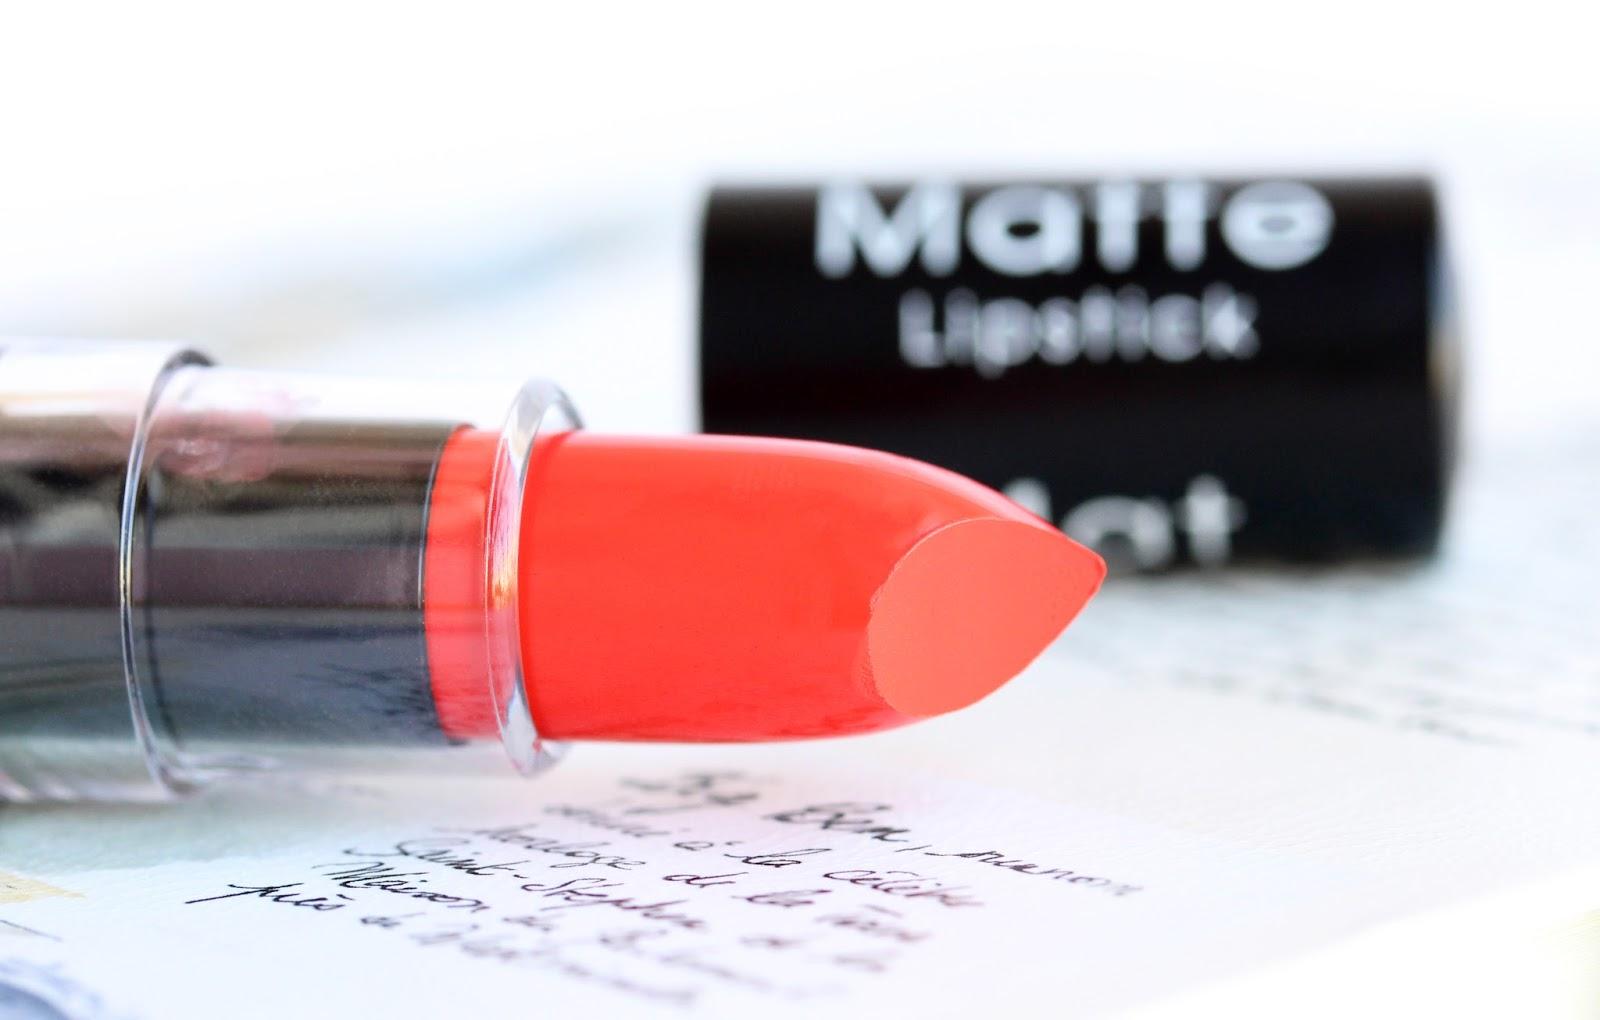 NYX Matte Lipstick in Indie Flick